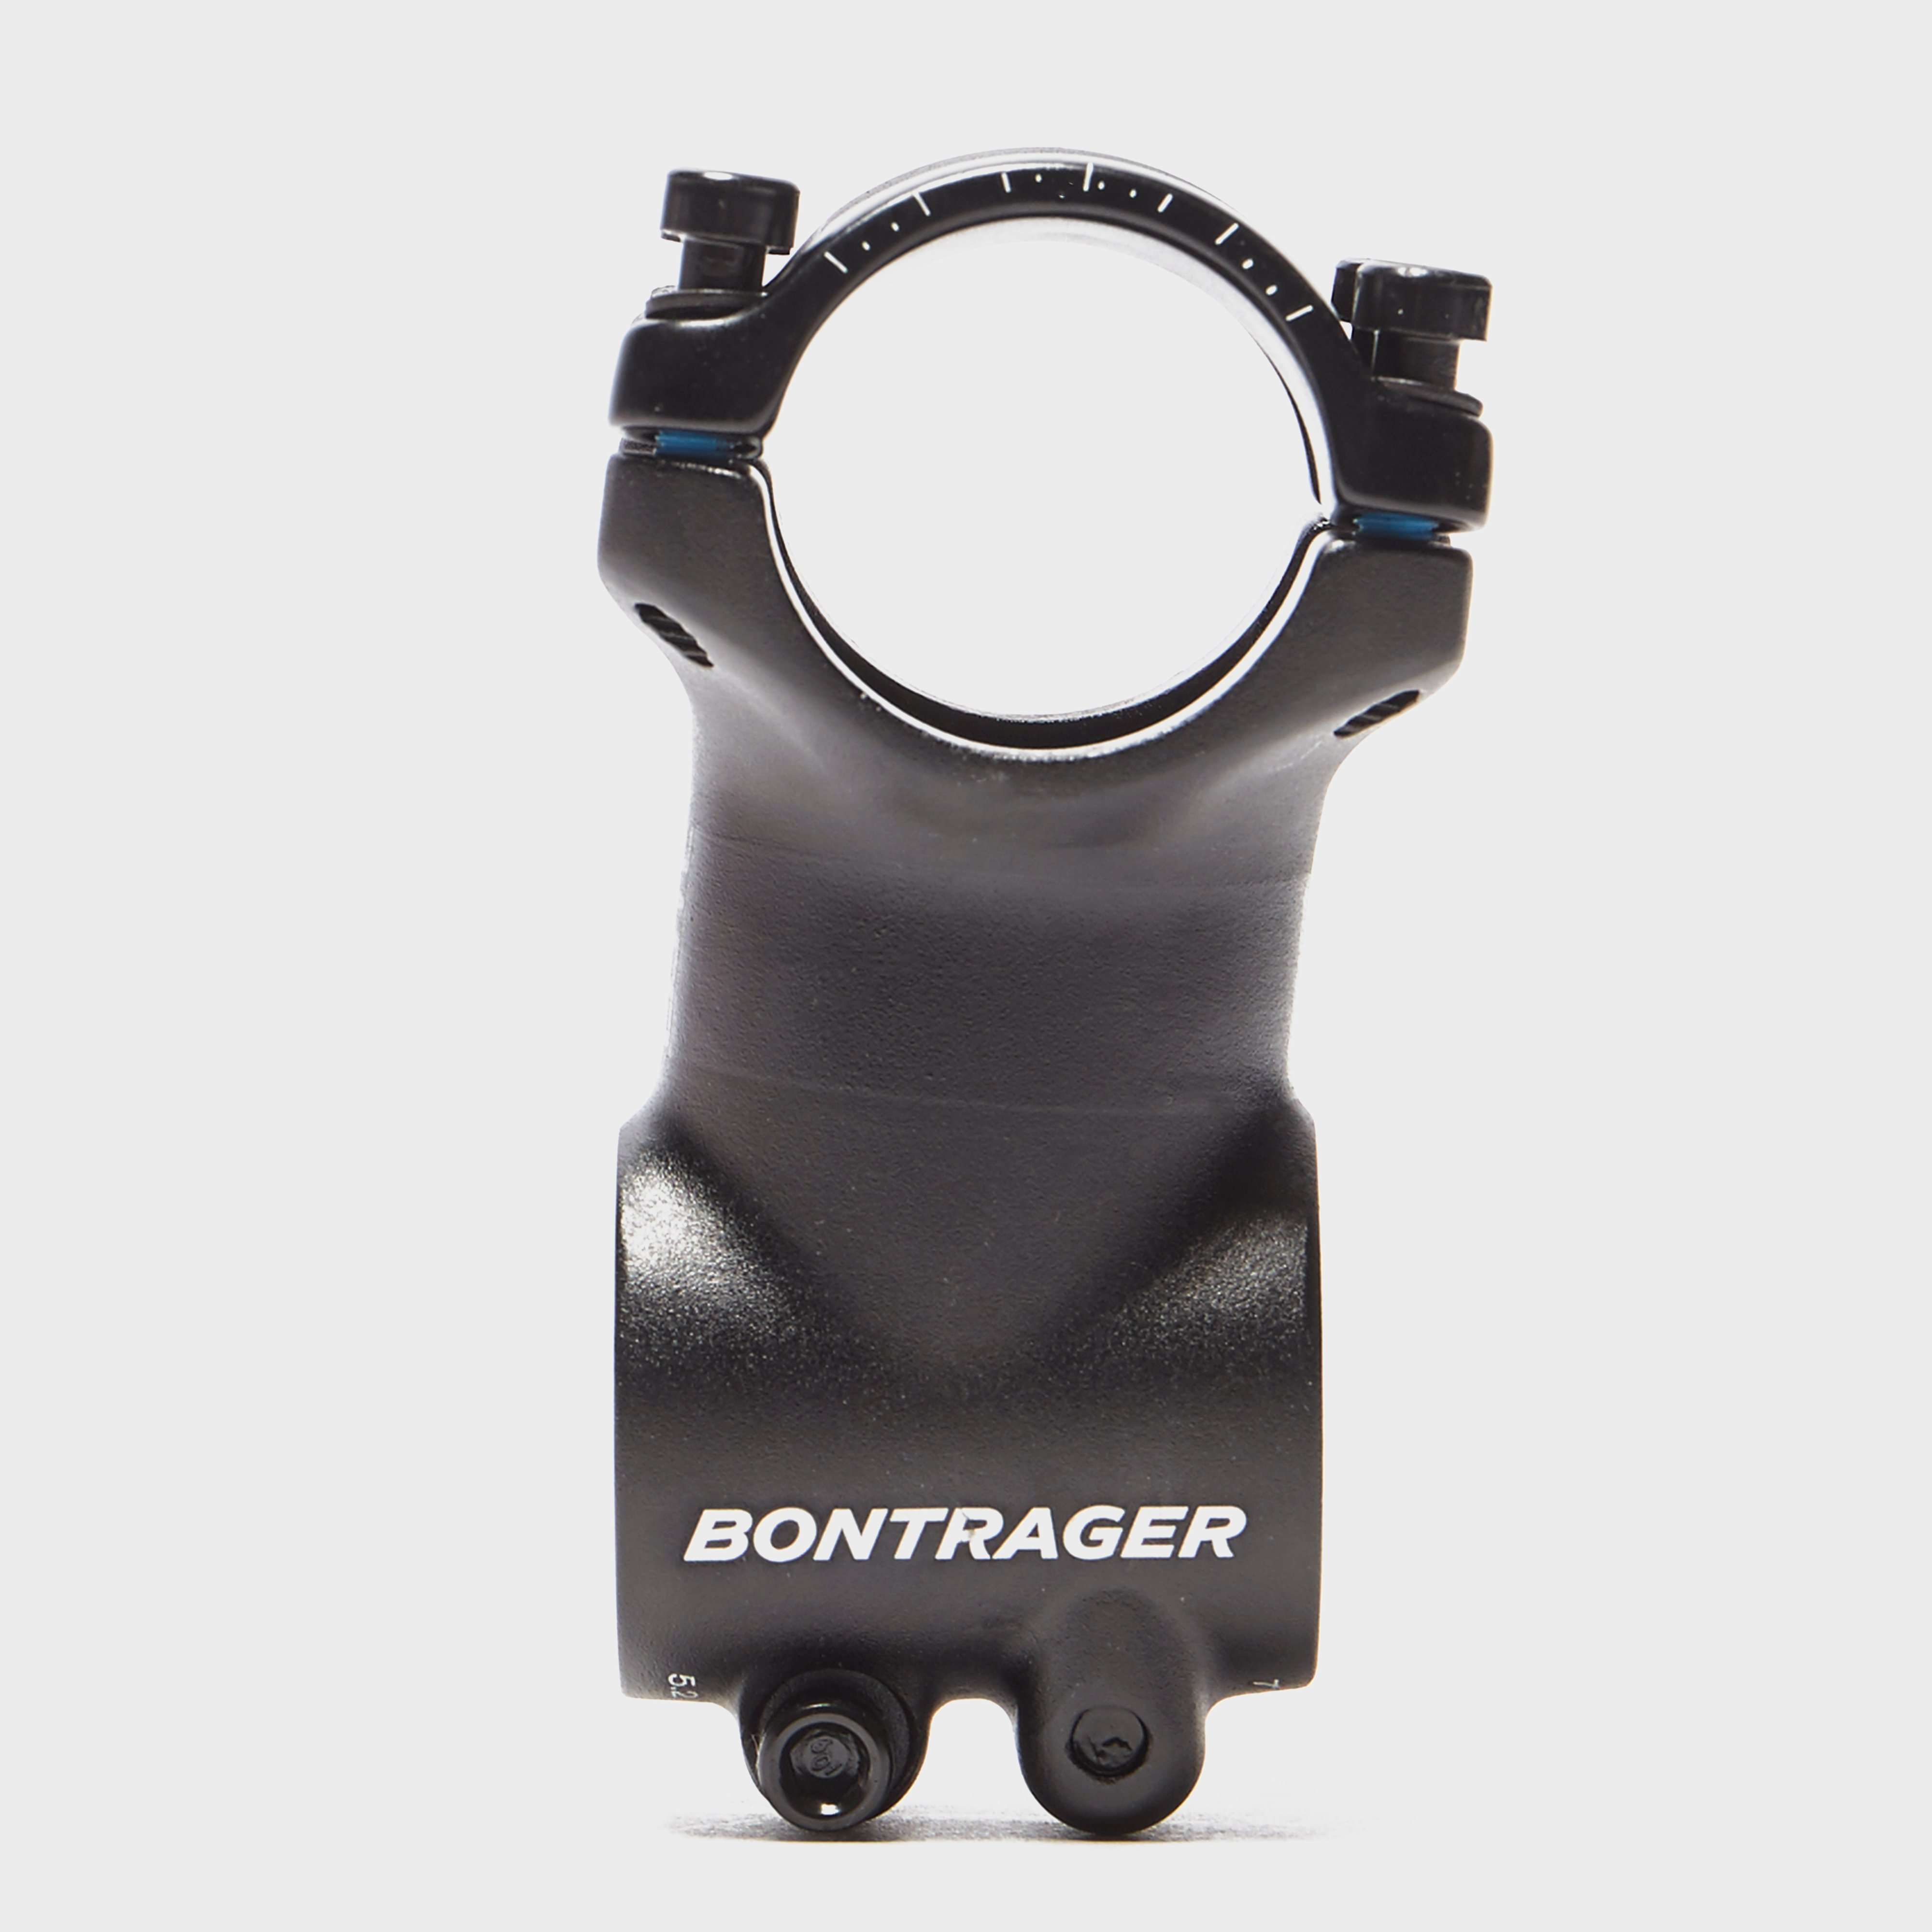 BONTRAGER Elite 7 Degree Stem 60mm